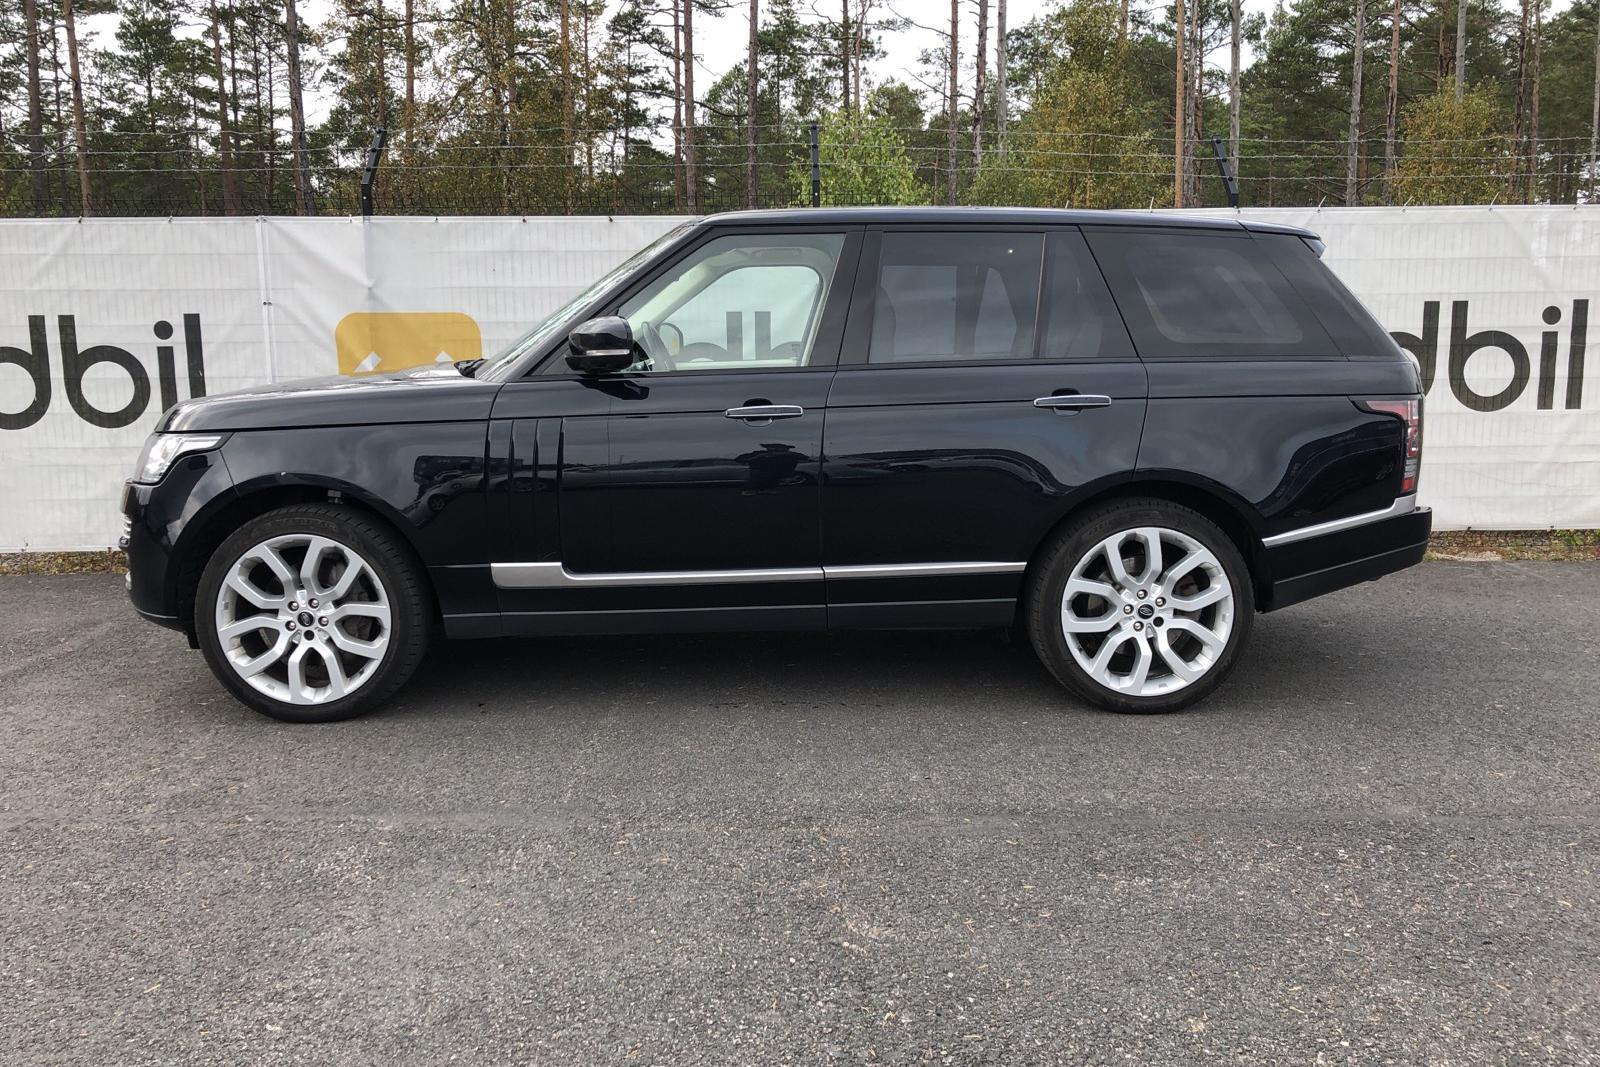 Land Rover Range Rover 4.4 SDV8 AWD (339hk) - 27 398 mil - Automat - svart - 2015